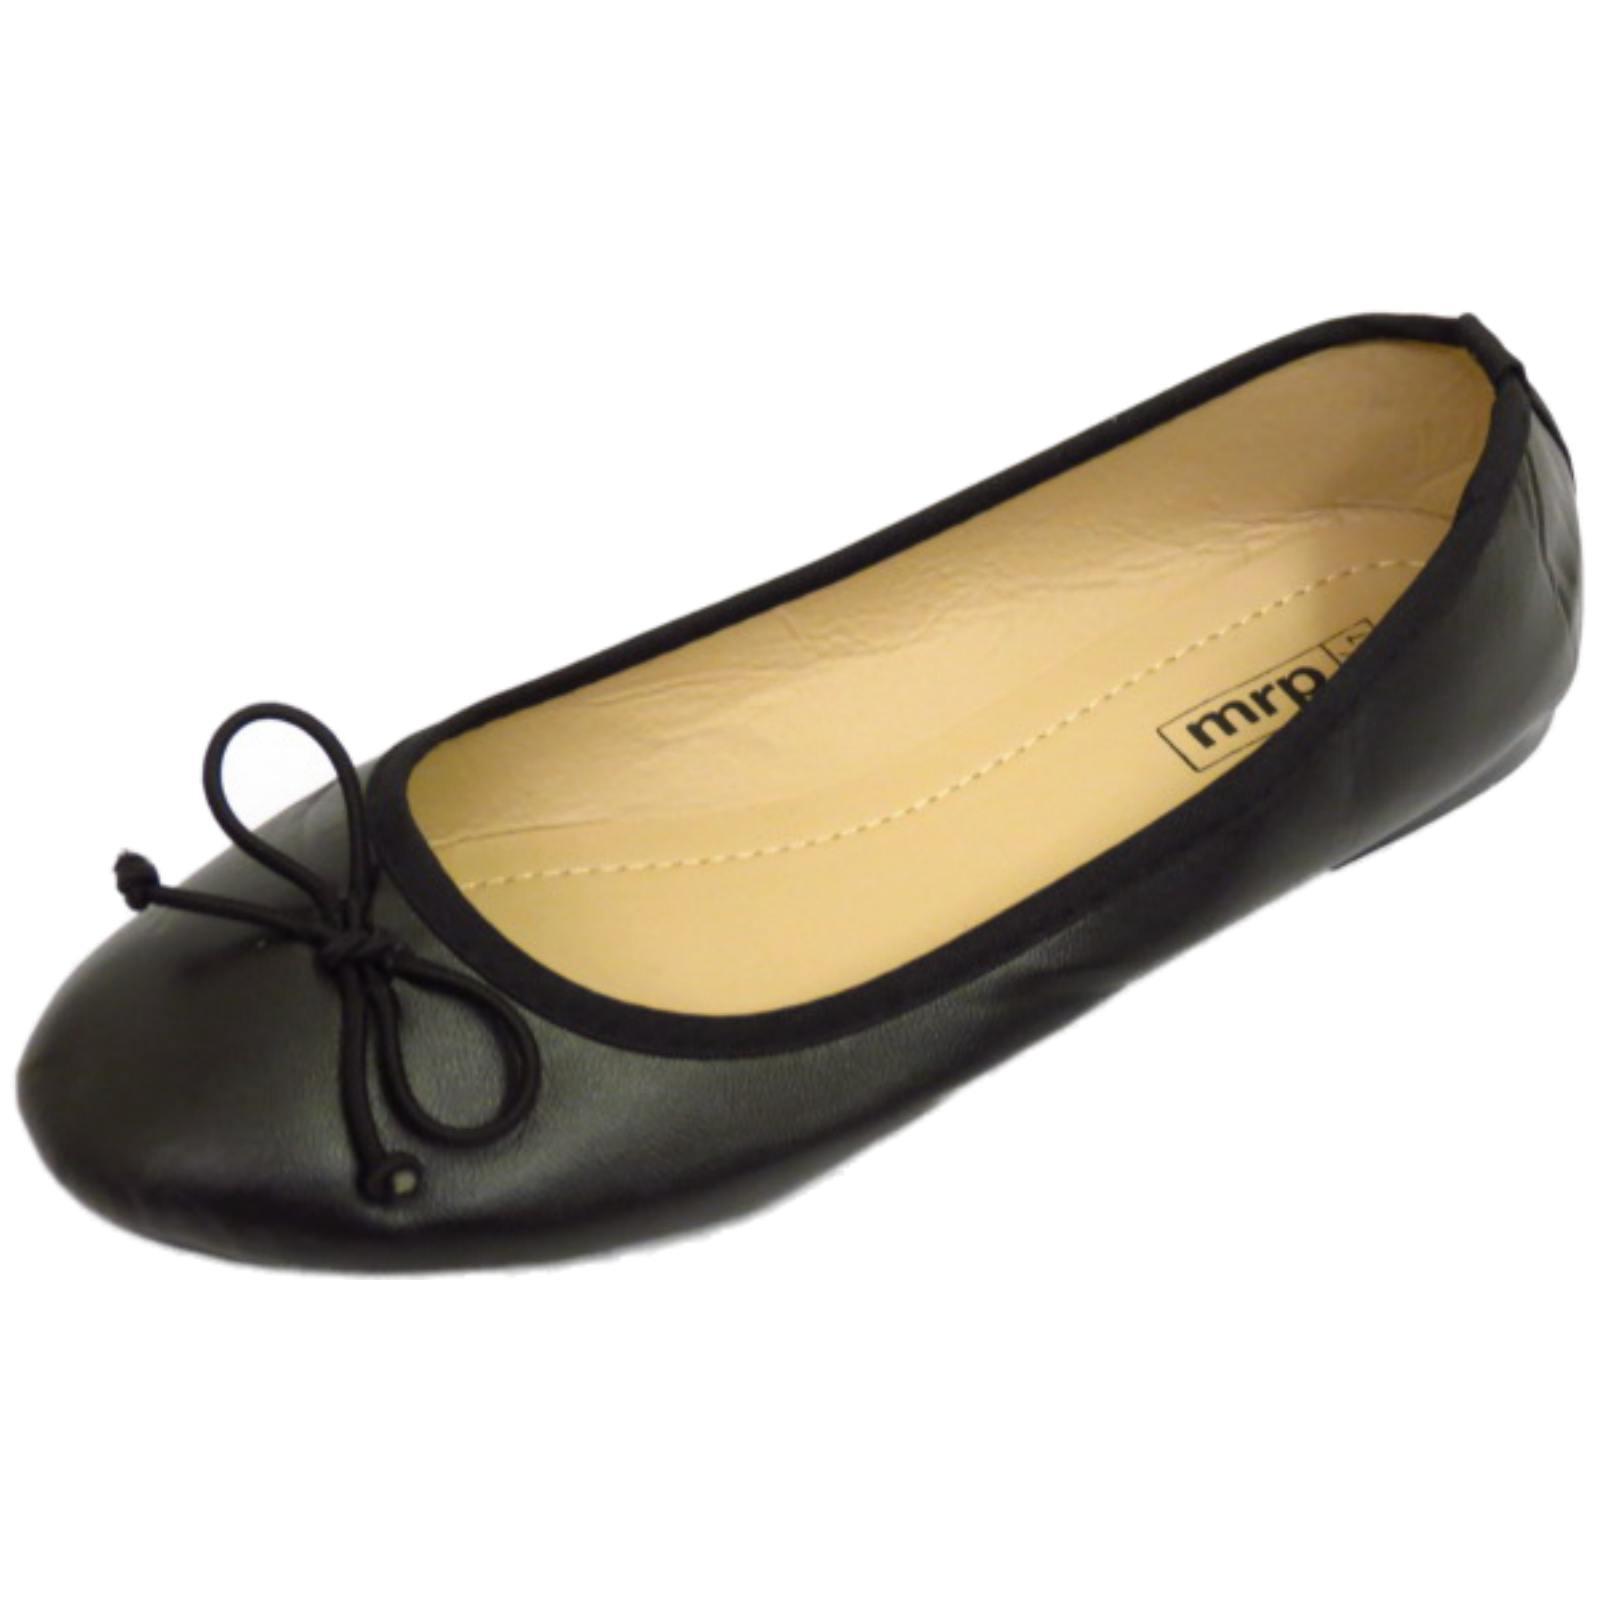 Damen flach schwarz zum reinschlüpfen Schuhe Puppe bequem Ballet Ballerina